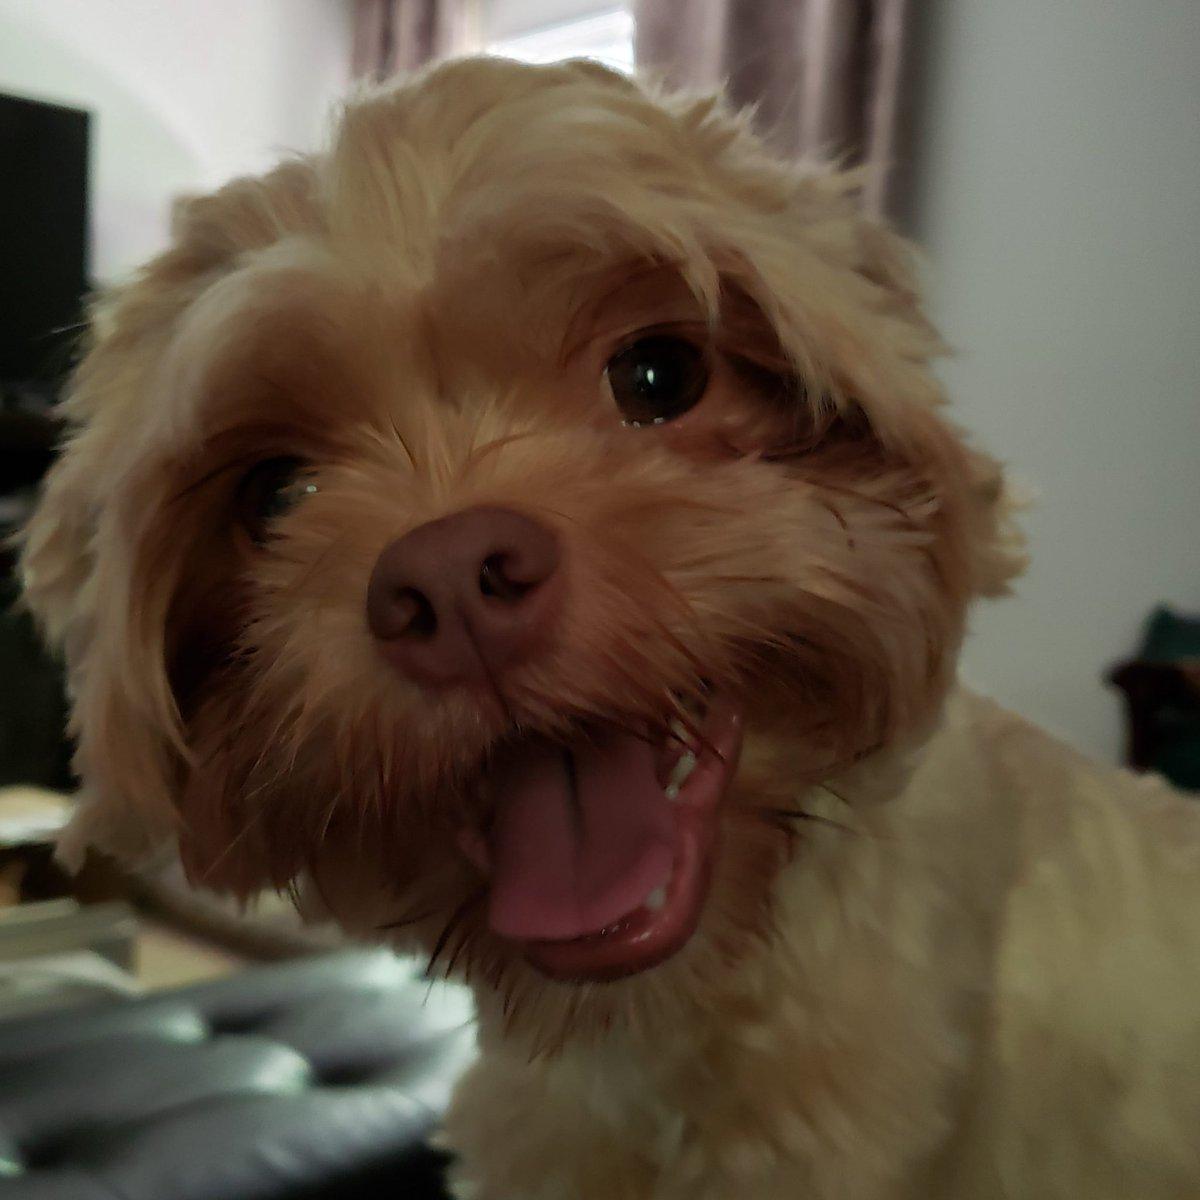 Joey's always such a happy boy #dog #muppetdog #happydog #smilingdog #dogsmiling #dogfaces #doglooks #dogsarelove #dogsarefamilypic.twitter.com/bssqkkXfyo